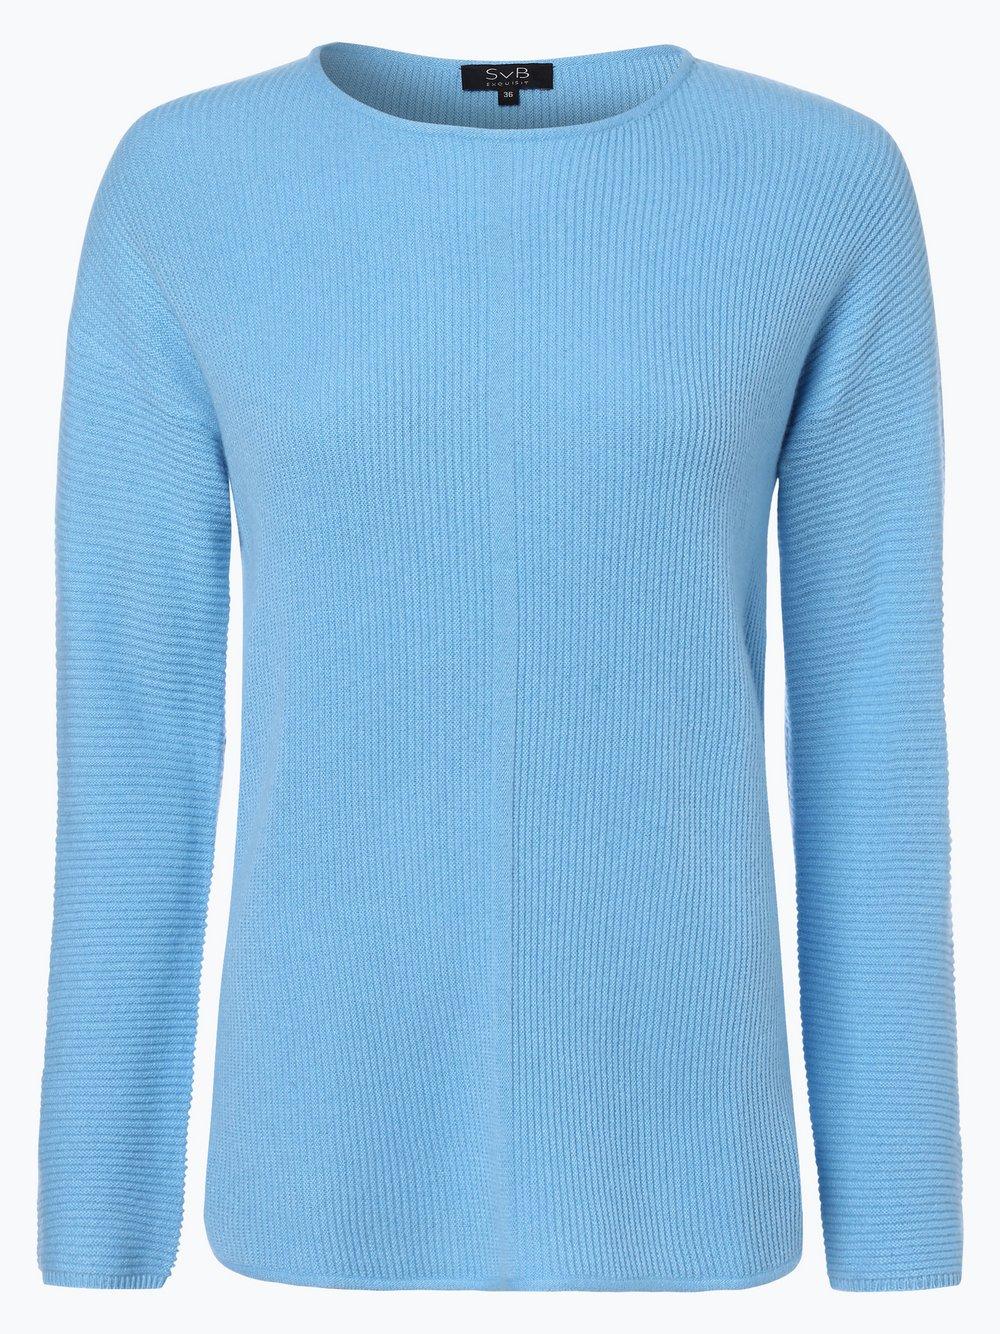 Premium-Auswahl eb0ae 21e18 SvB Exquisit Damen Pure Cashmere Pullover online kaufen ...